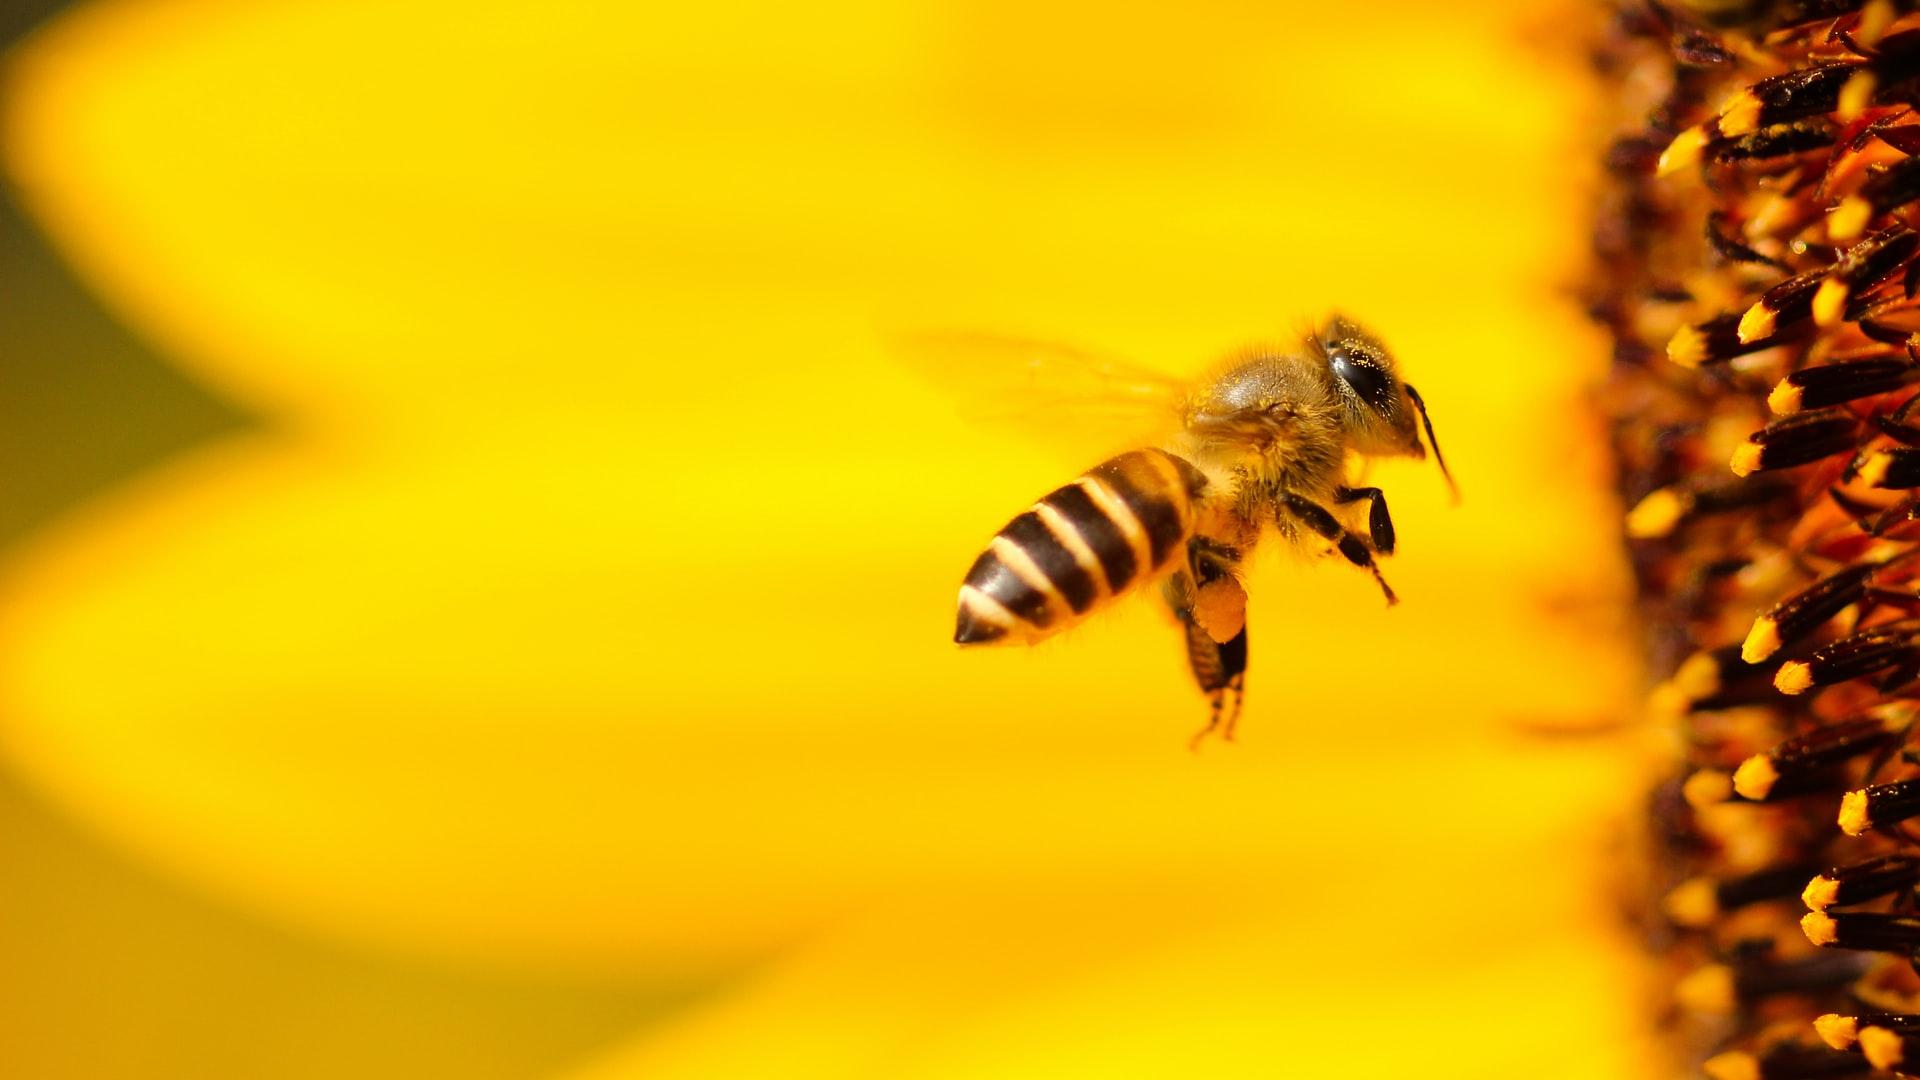 BEE FRIENDLY: HILF DEN BIENEN